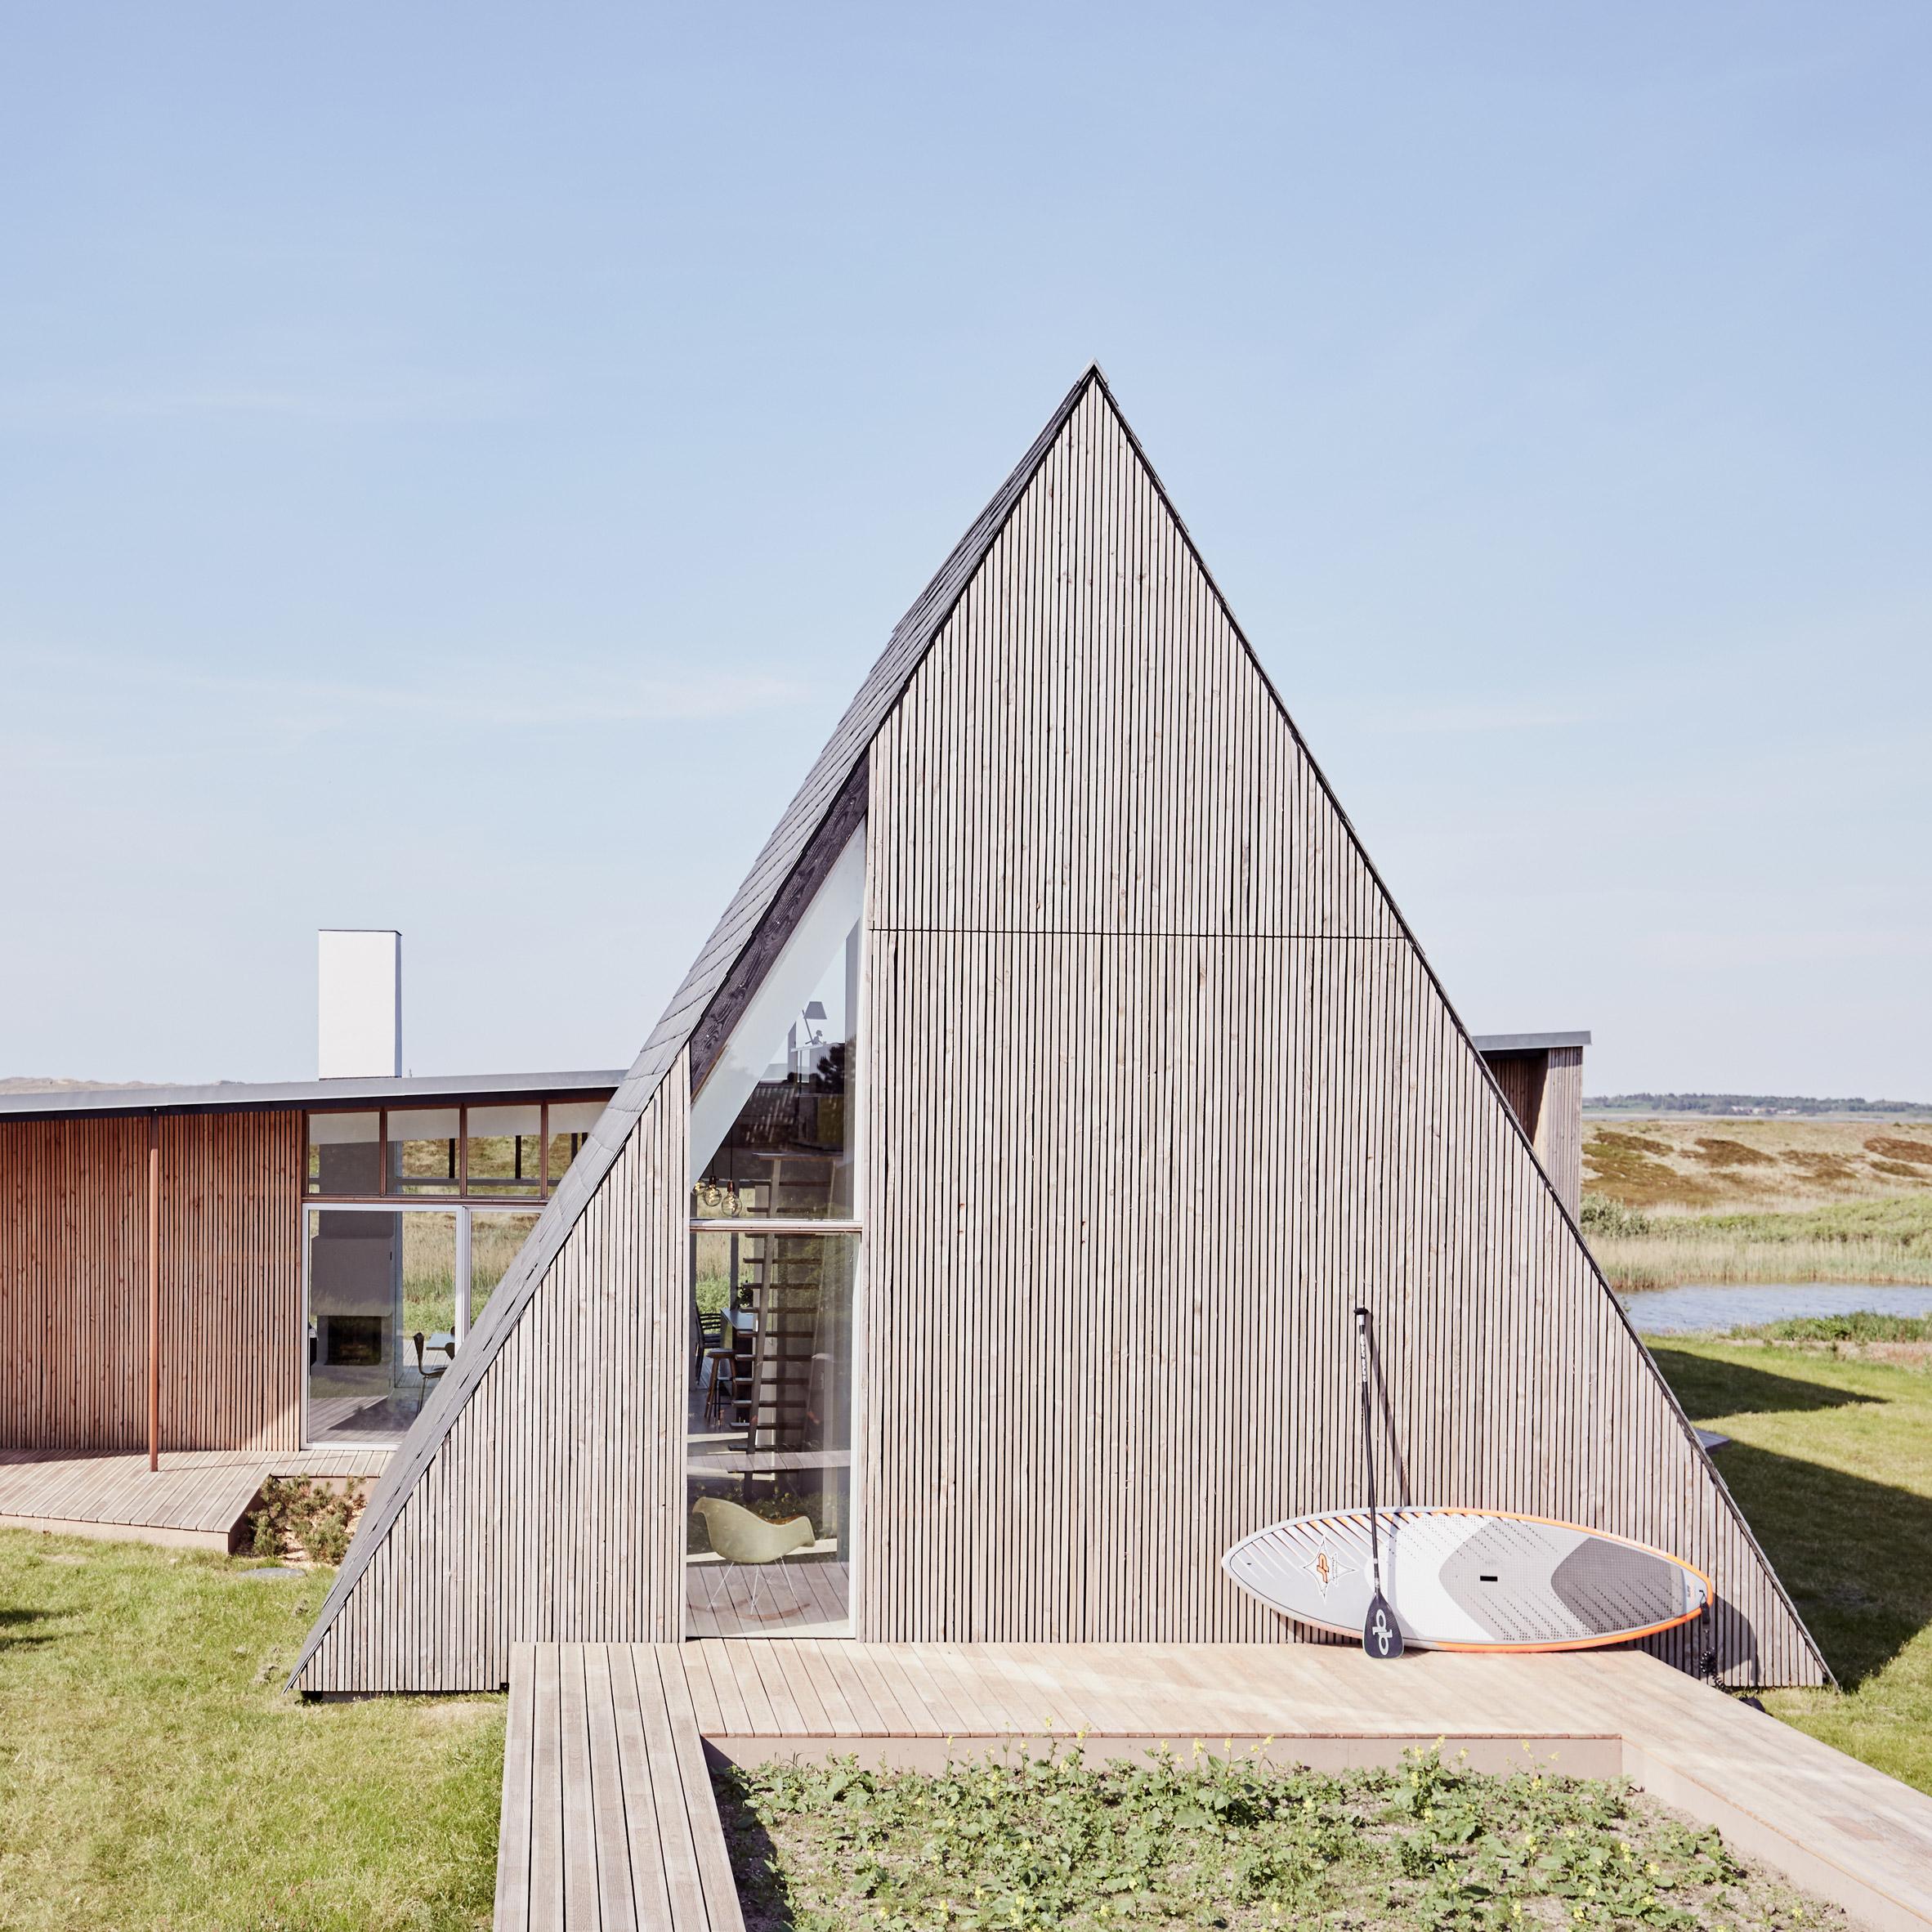 Urlaub Architektur's Holiday Architecture book roundup: Light House by Søren Sarup